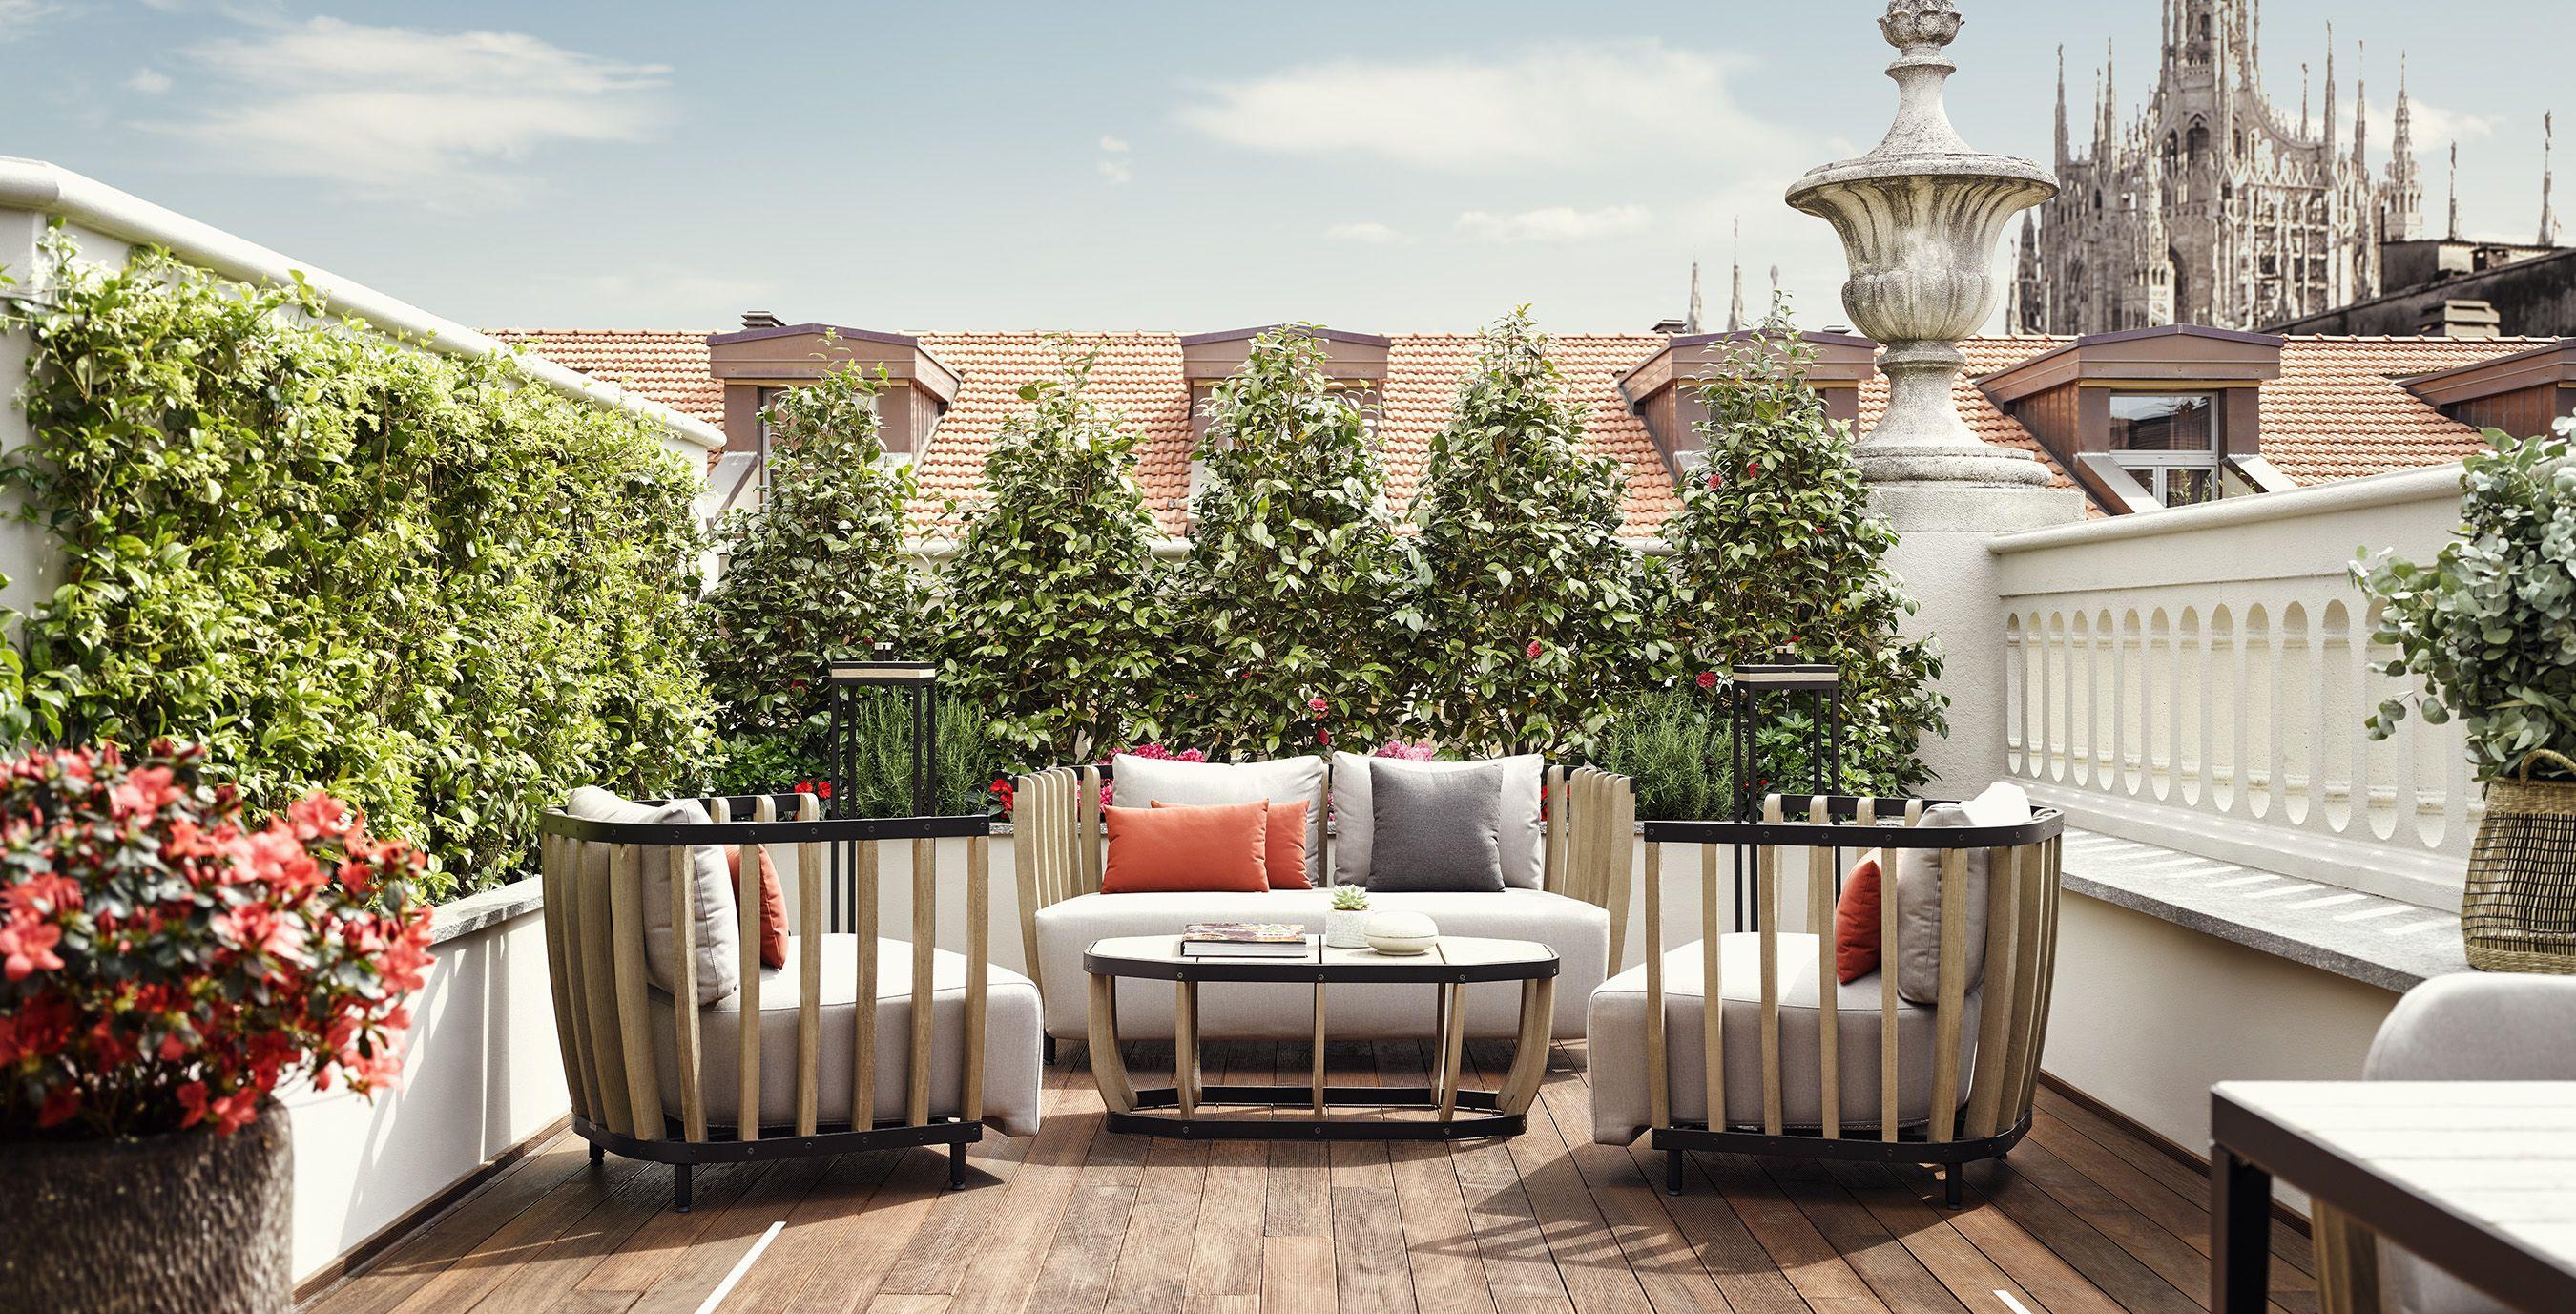 Ethimo S Outdoor Furniture At Park Hyatt Milan An